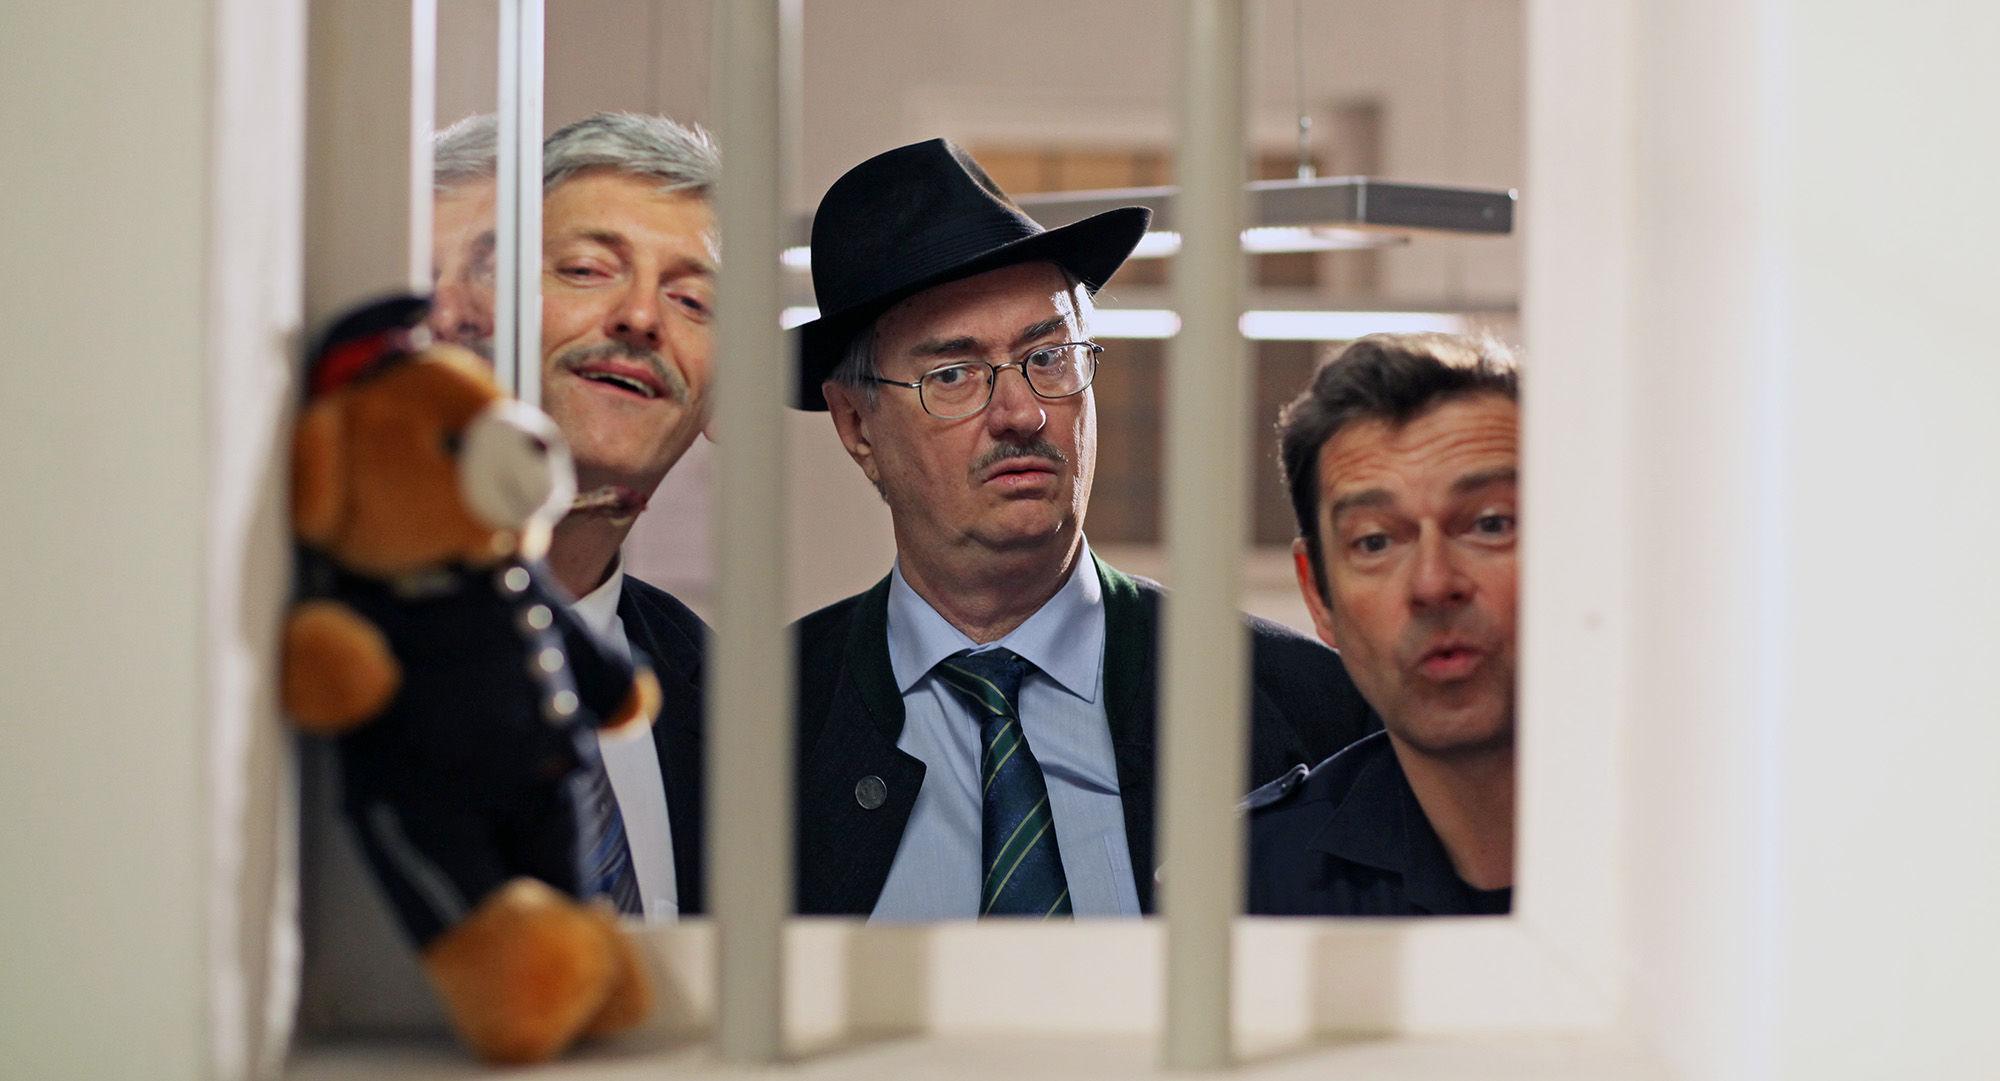 Manfred Dungl (Traugott Pimpf), Gerhard Zemann (Chefinspektor Zirmgiebel), Andreas Steppan (August Horrowitz)